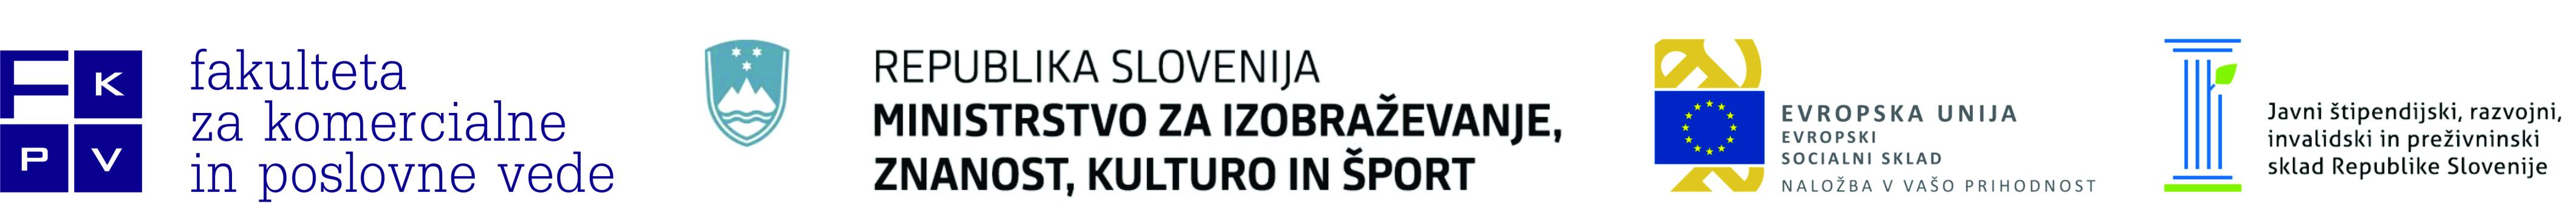 karierna-pot-2017